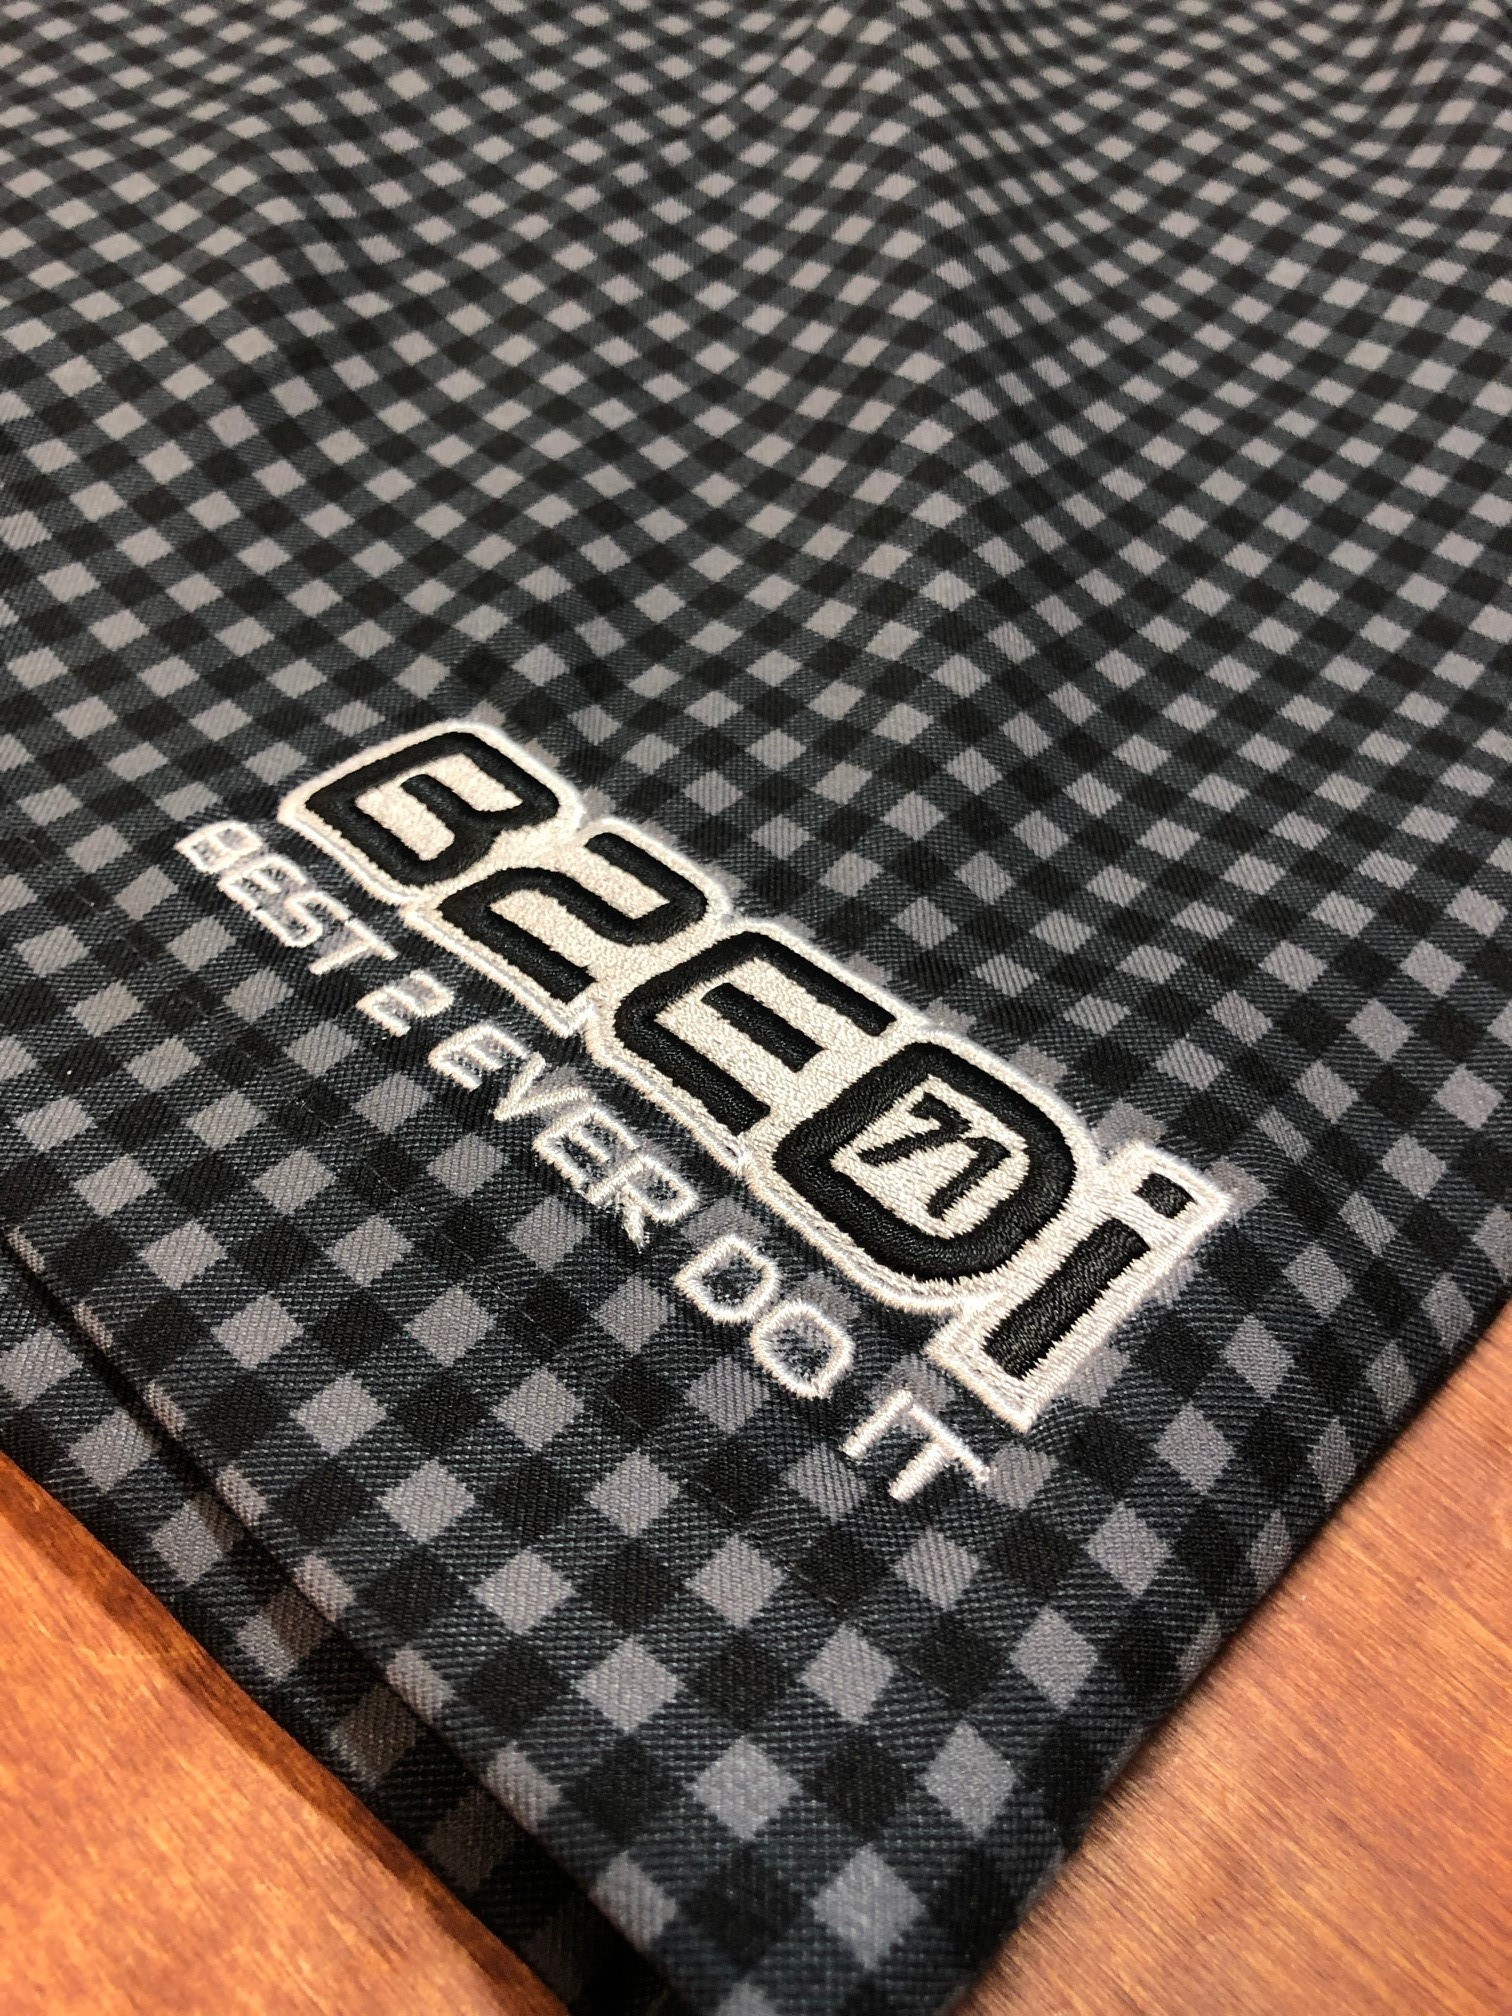 logounltd_laser_etching_embroidery_screen_printing_apparel_uniform_custom_tshirts_t_shirt_kirkland_bellevue_seattle_redmond_woodinville_branded_merchandise_promotional_products_logo_unltd_b2edi_seahawks_walter_jones_71 (3).jpg